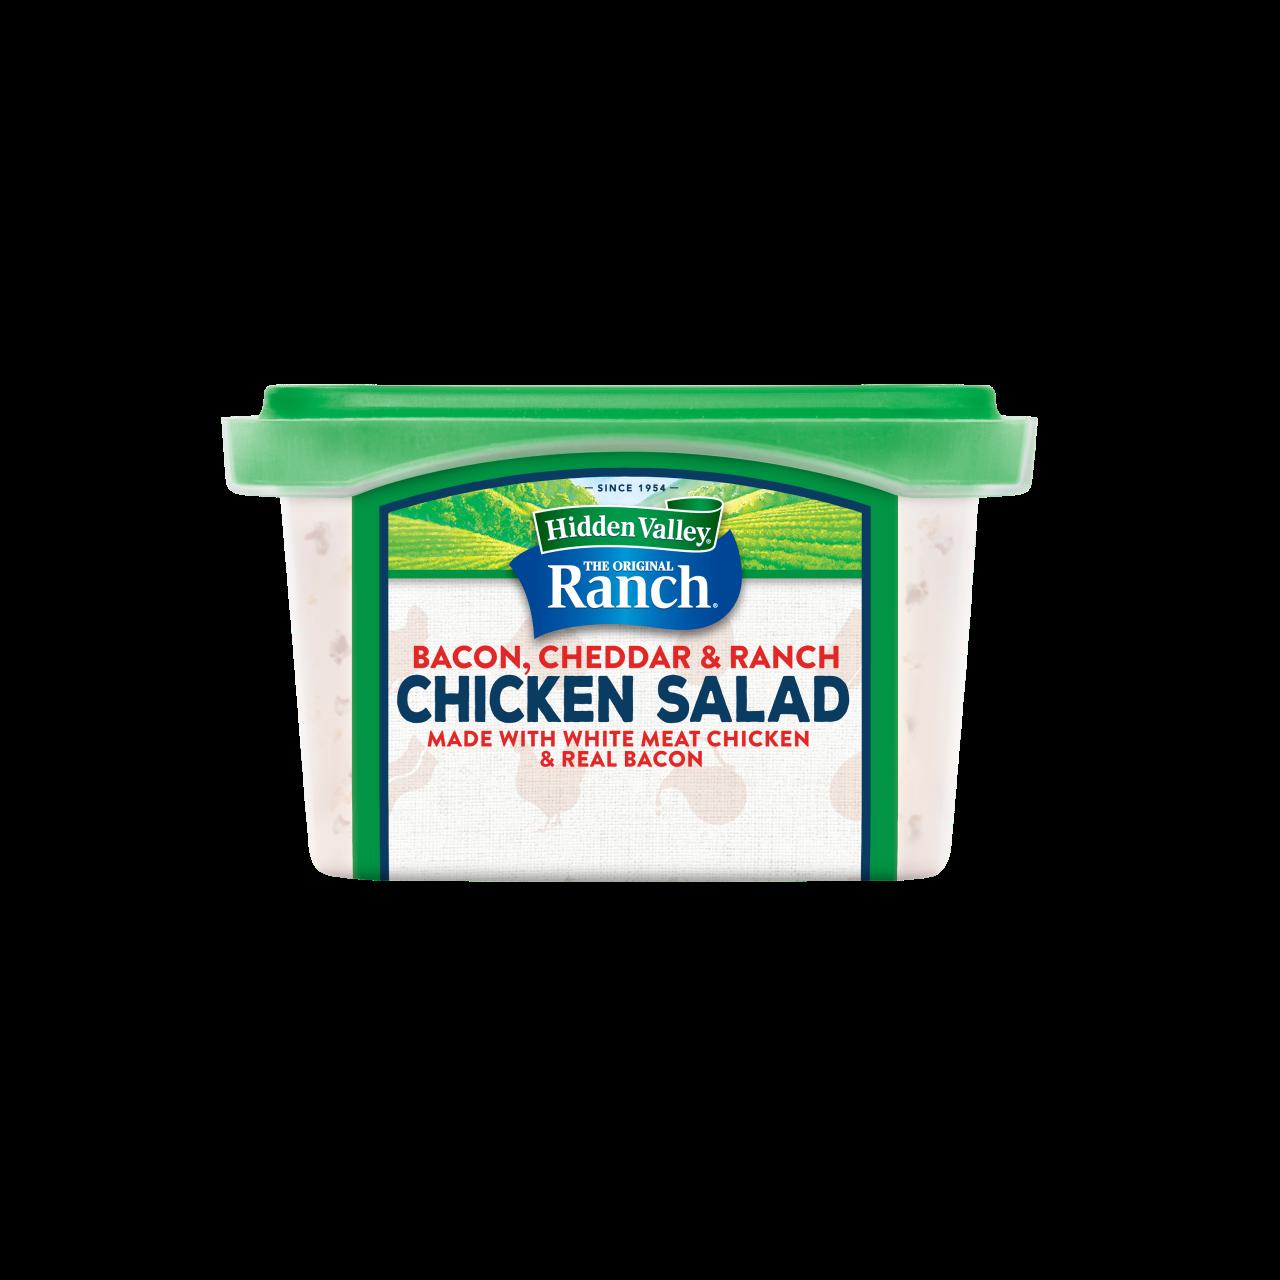 Hidden Valley® Bacon, Cheddar & Ranch Chicken Salad